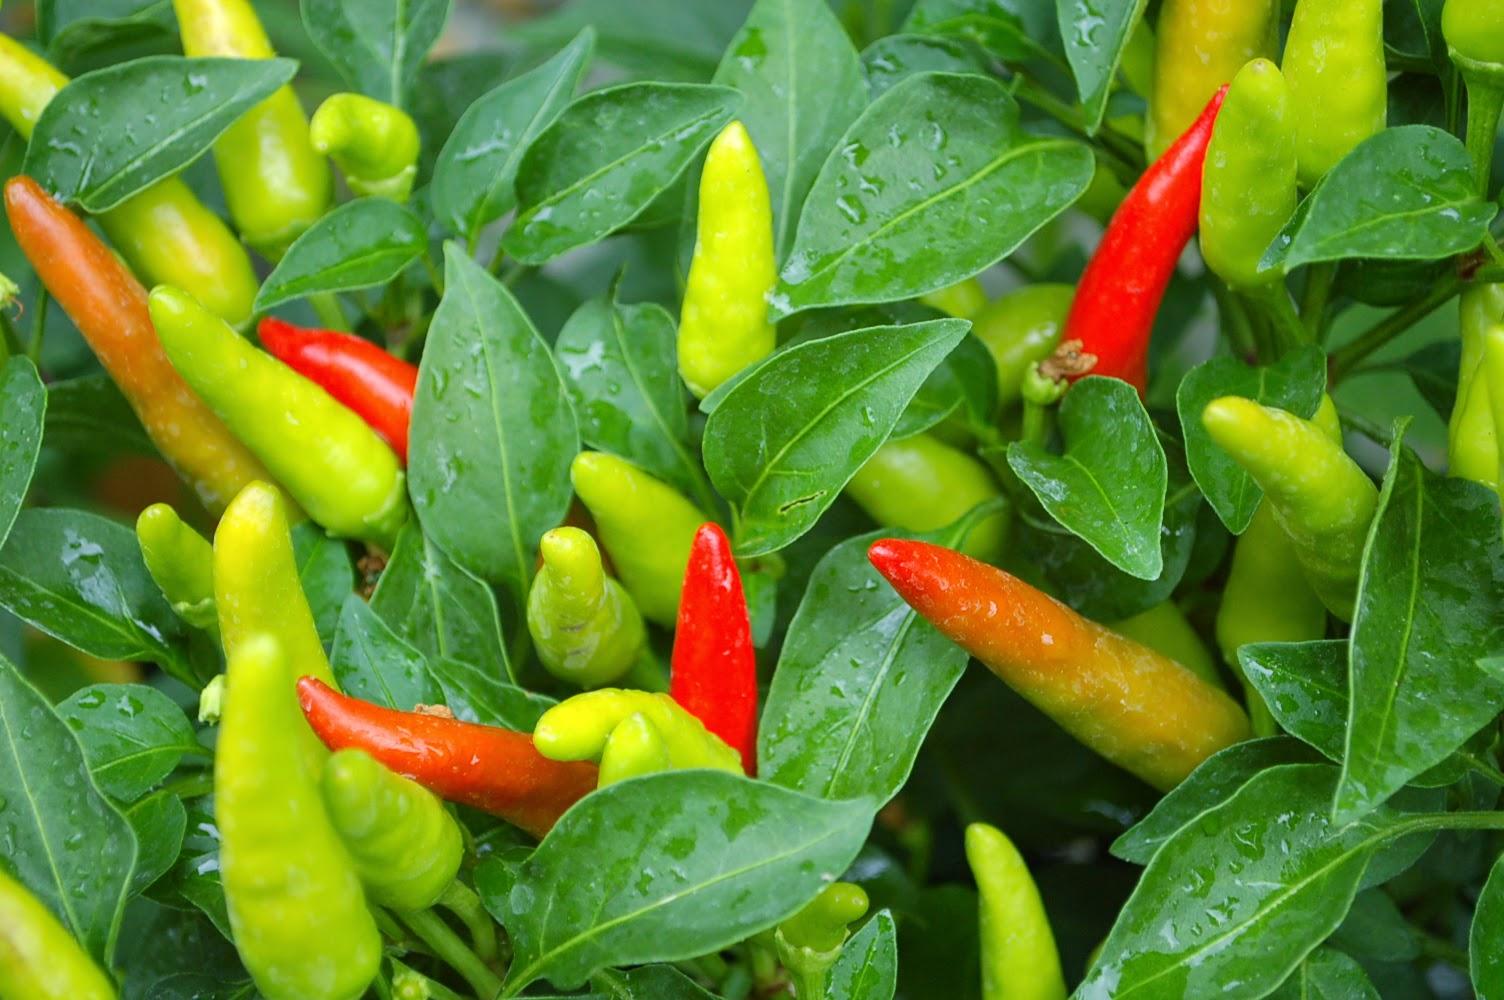 edible garden, vegetables, gardening